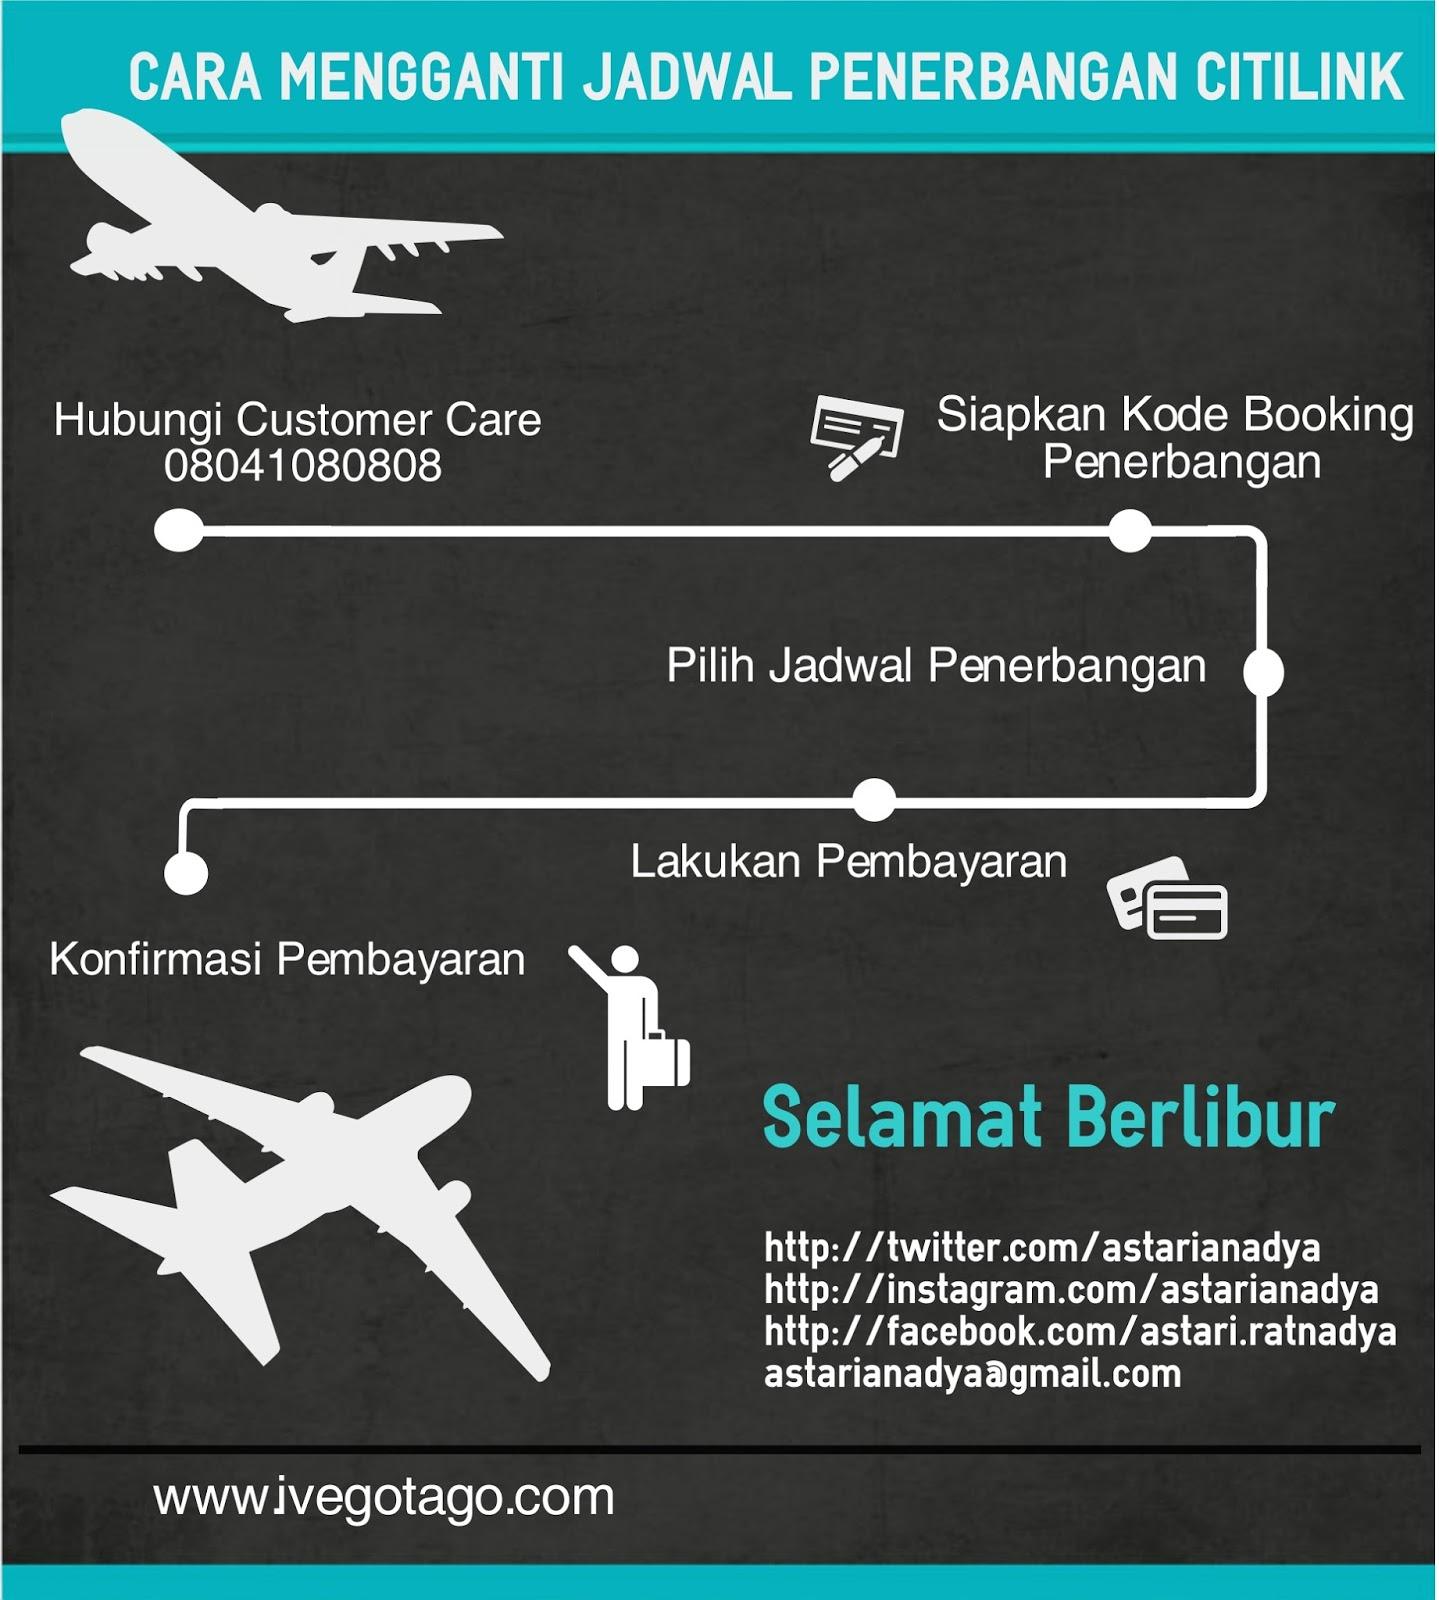 Astarianadya Cara Mengganti Jadwal Penerbangan Citilink